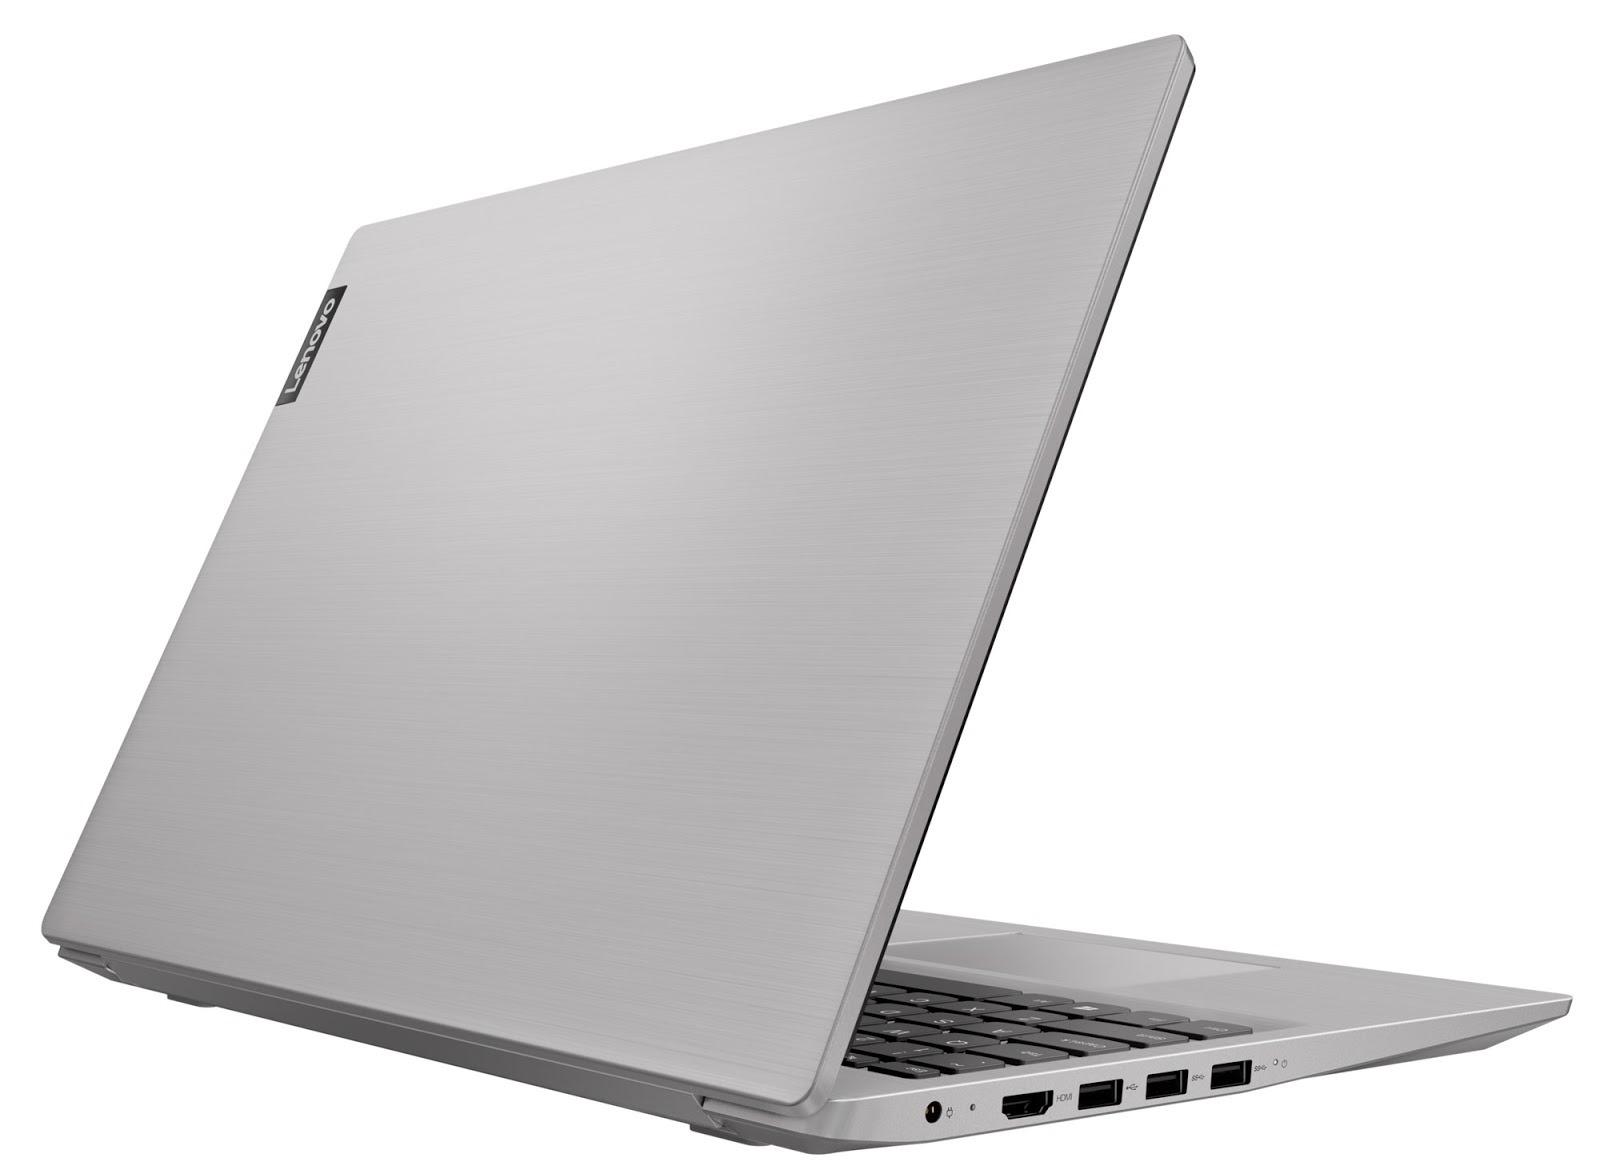 Фото 2. Ноутбук Lenovo ideapad S145-15IGM Grey (81MX001JRE)